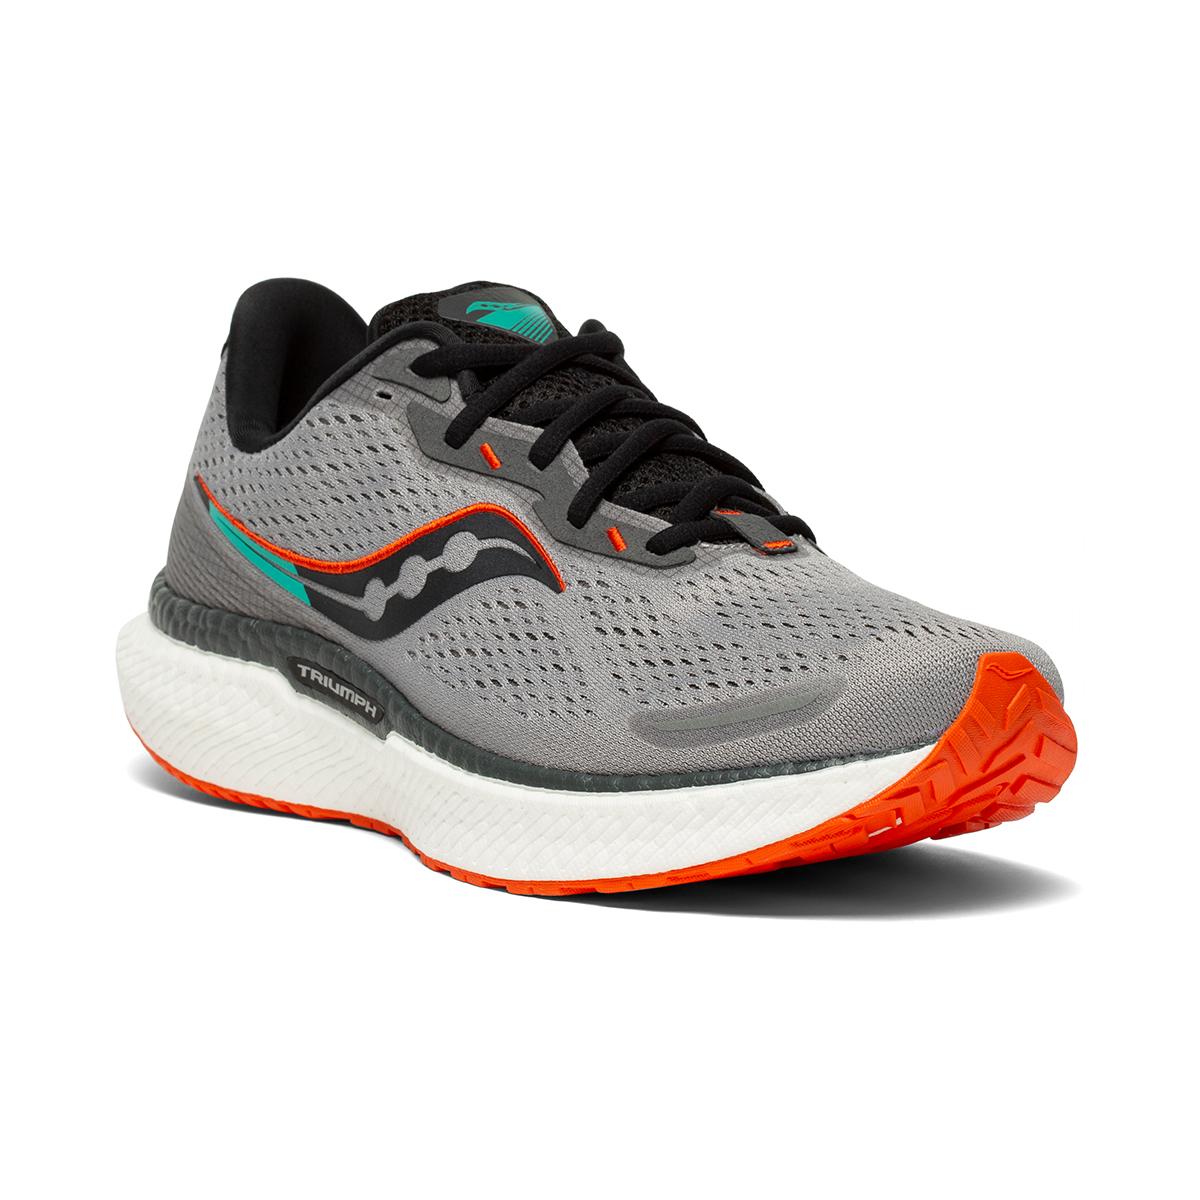 Men's Saucony Triumph 19 Running Shoe - Color: Alloy / Fire - Size: 7 - Width: Wide, Alloy / Fire, large, image 3